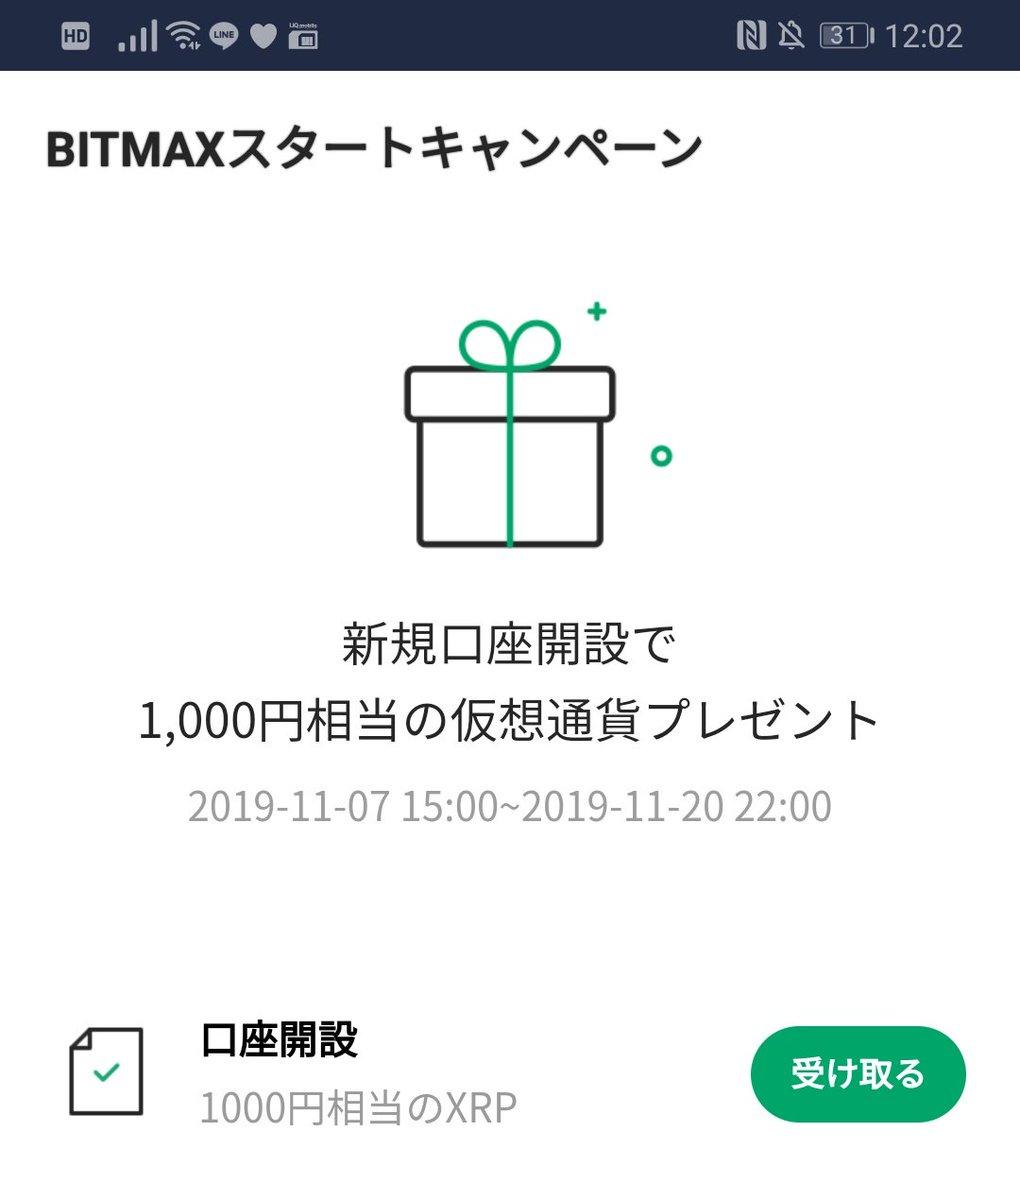 LINE 仮想通貨取引所BITMAX新規口座開設で1000円相当貰える自分は2分で口座開設出来ました本人確認書類不要でした(*´ω`*) 貰える仮想通貨はリップル(XRP)これはやるべき案件(﹡ˆ﹀ˆ﹡)♡↓他のキャンペーンは 続く.......